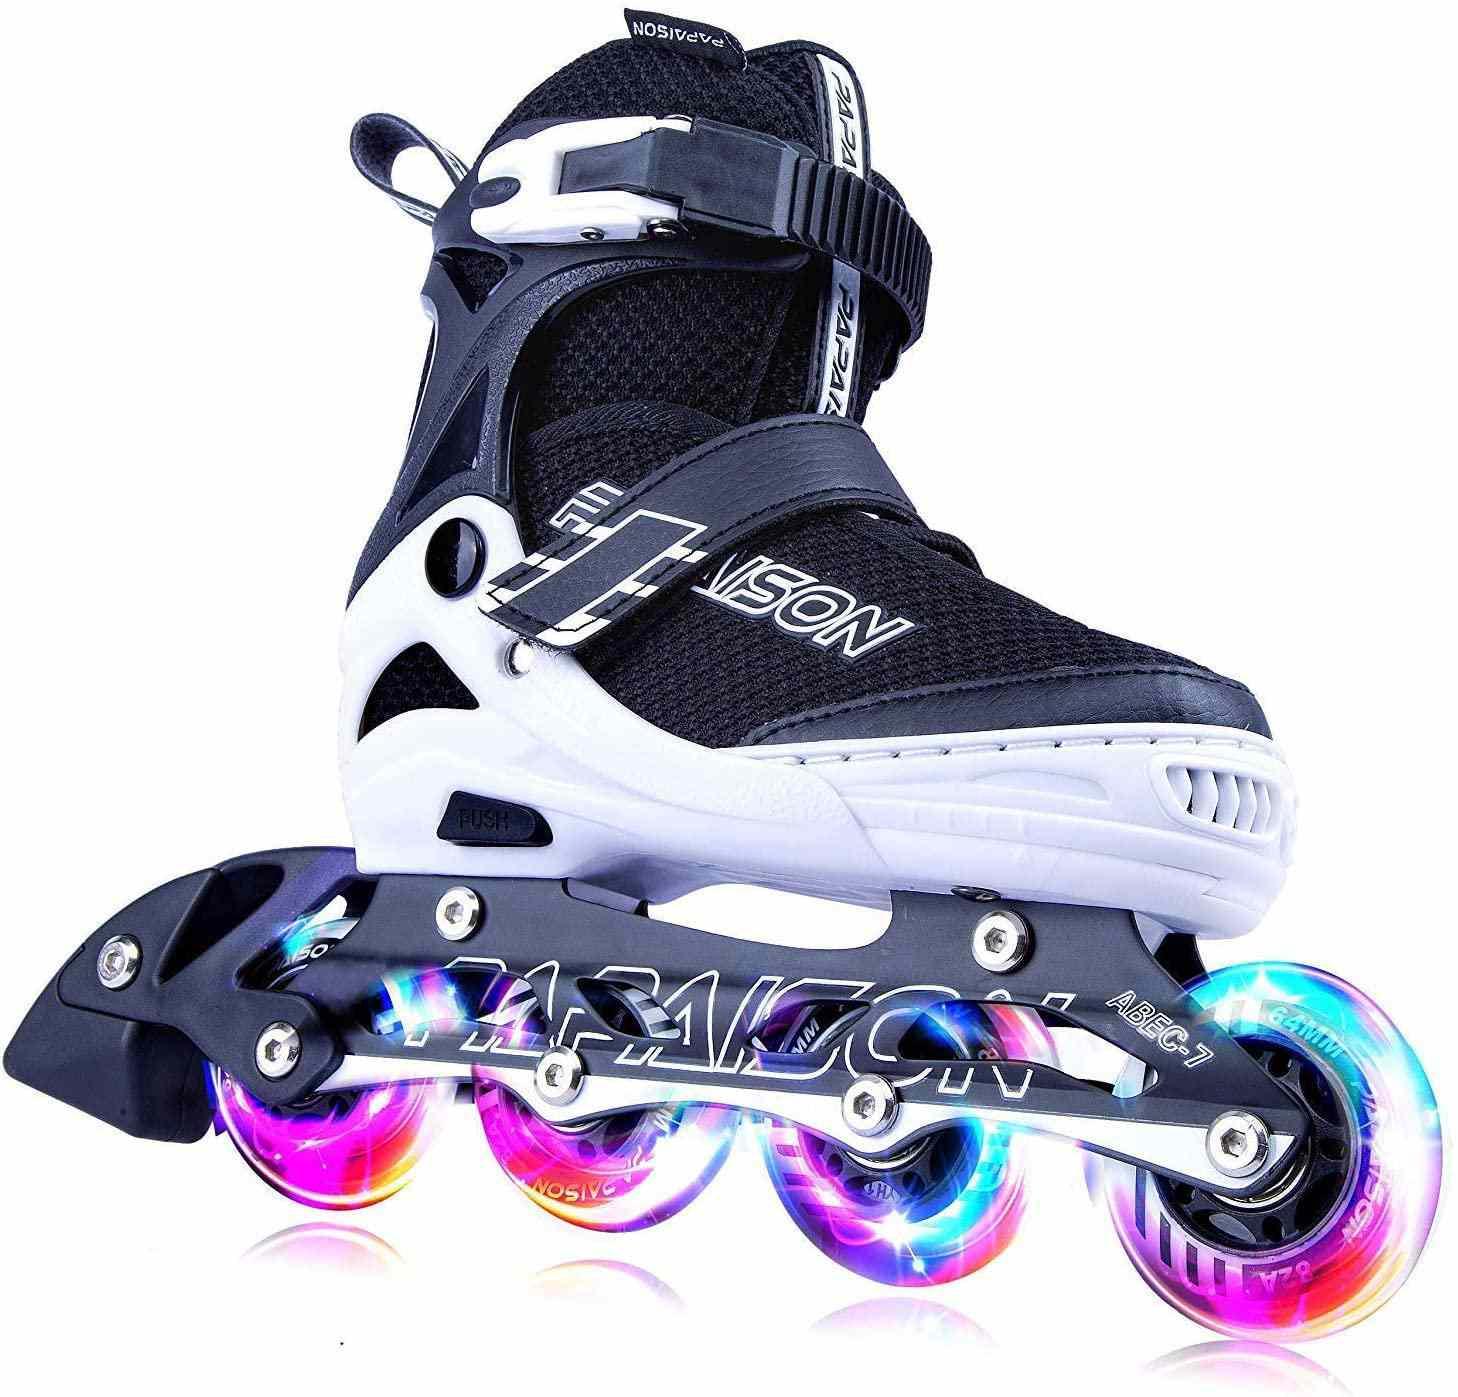 Papaison Adjustable Inline Skate